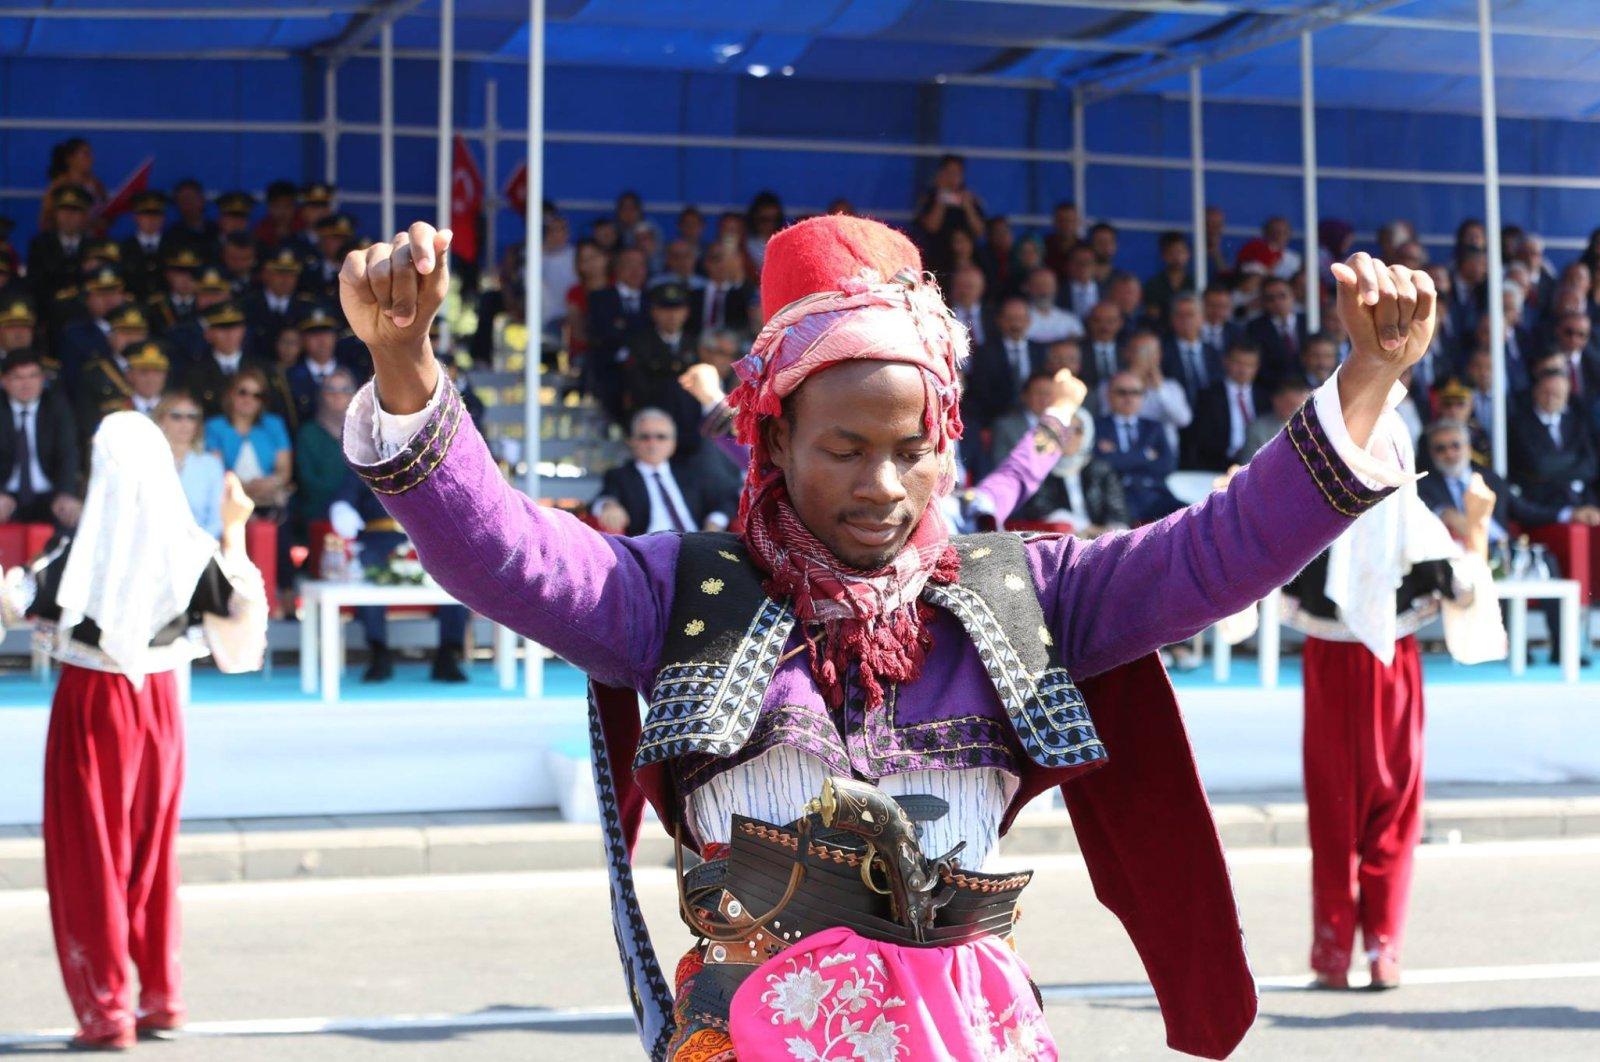 A Ugandan student performs Turkish folkloric dance in Kayseri, Turkey, Aug. 30, 2018. (Photo by Ali Altundaş)